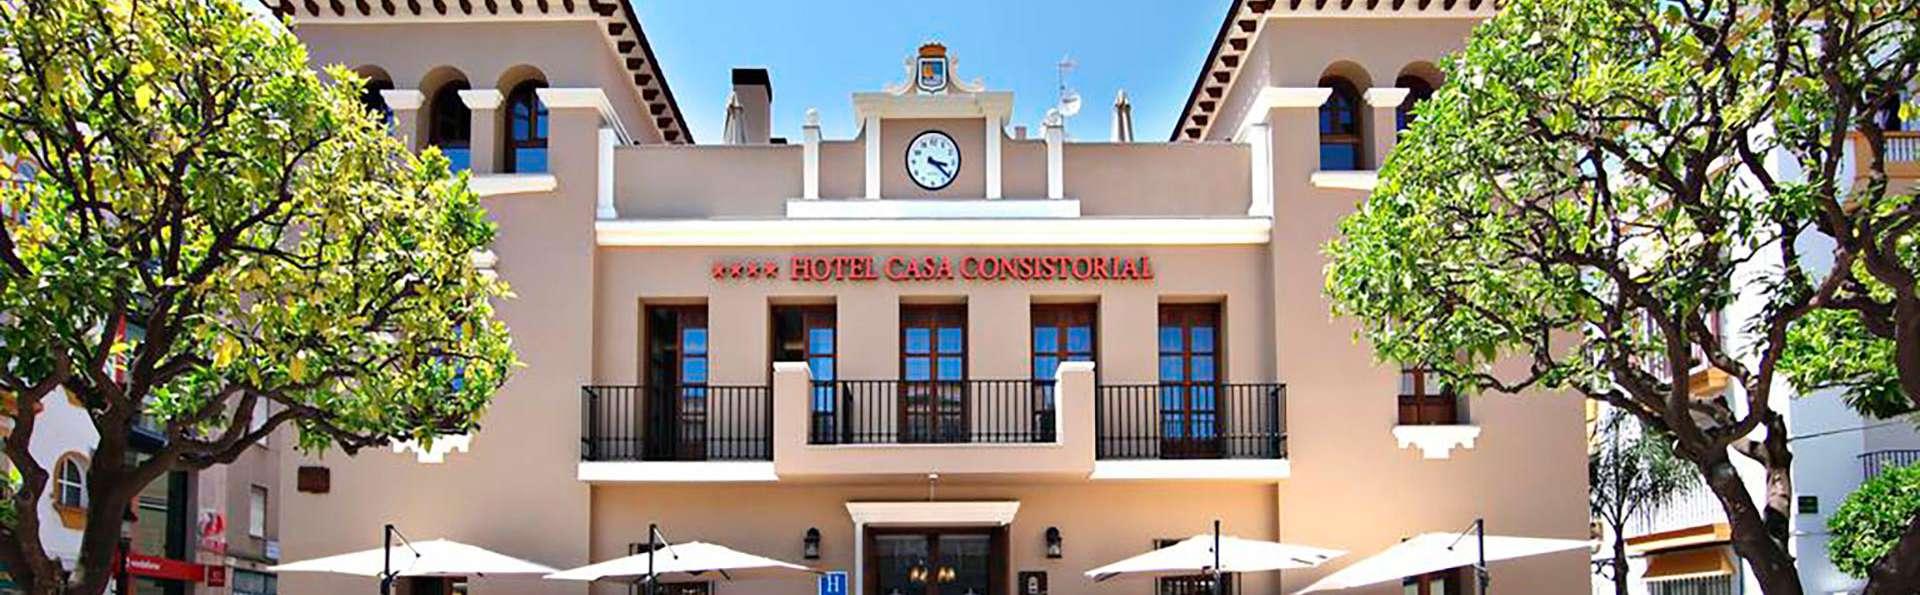 Hotel Casa Consistorial  - EDIT_FRONT_01.jpg